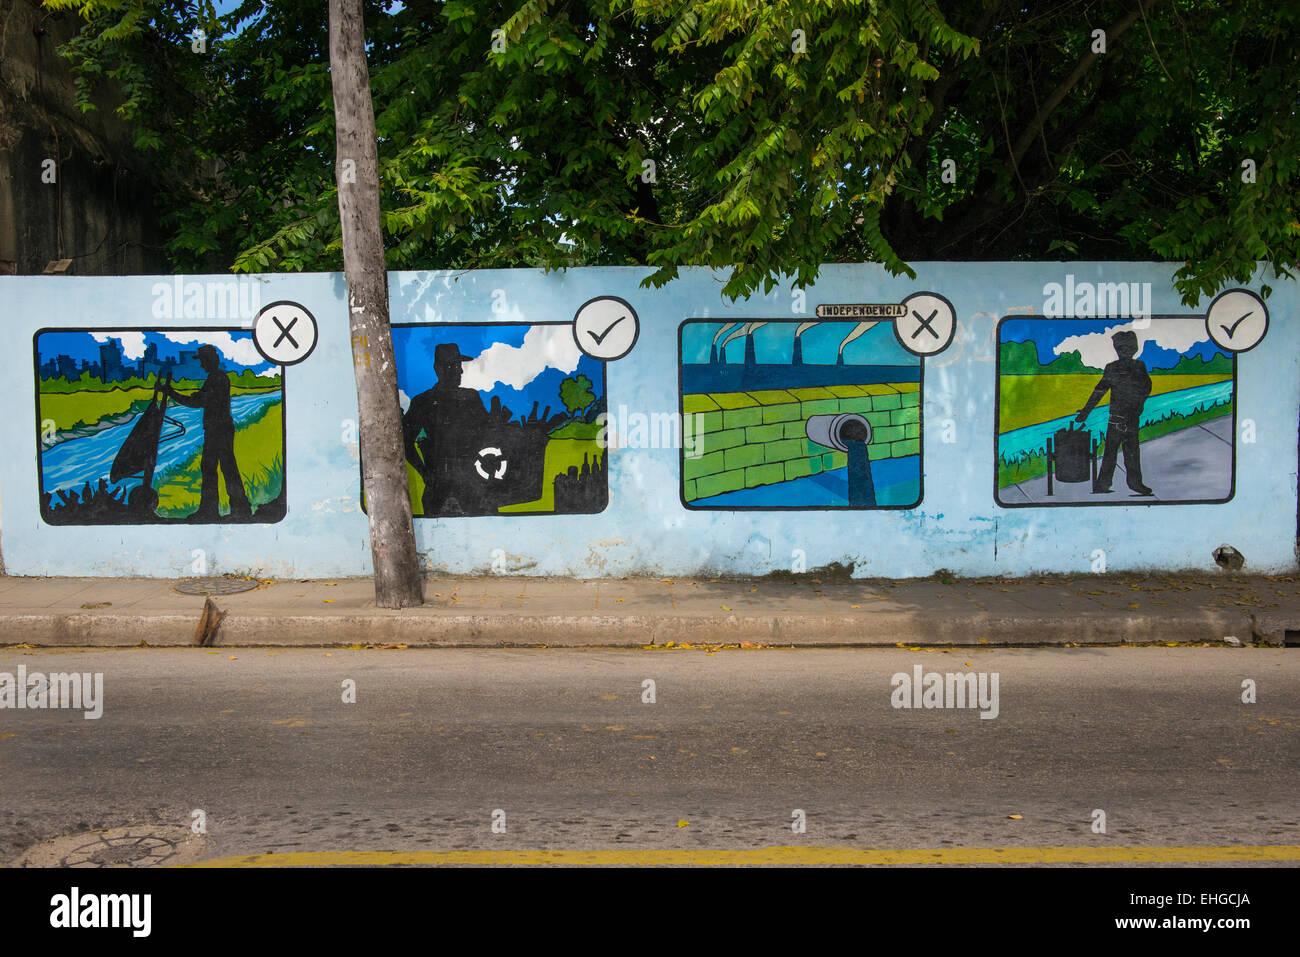 Imagenes De Murales Ambientales